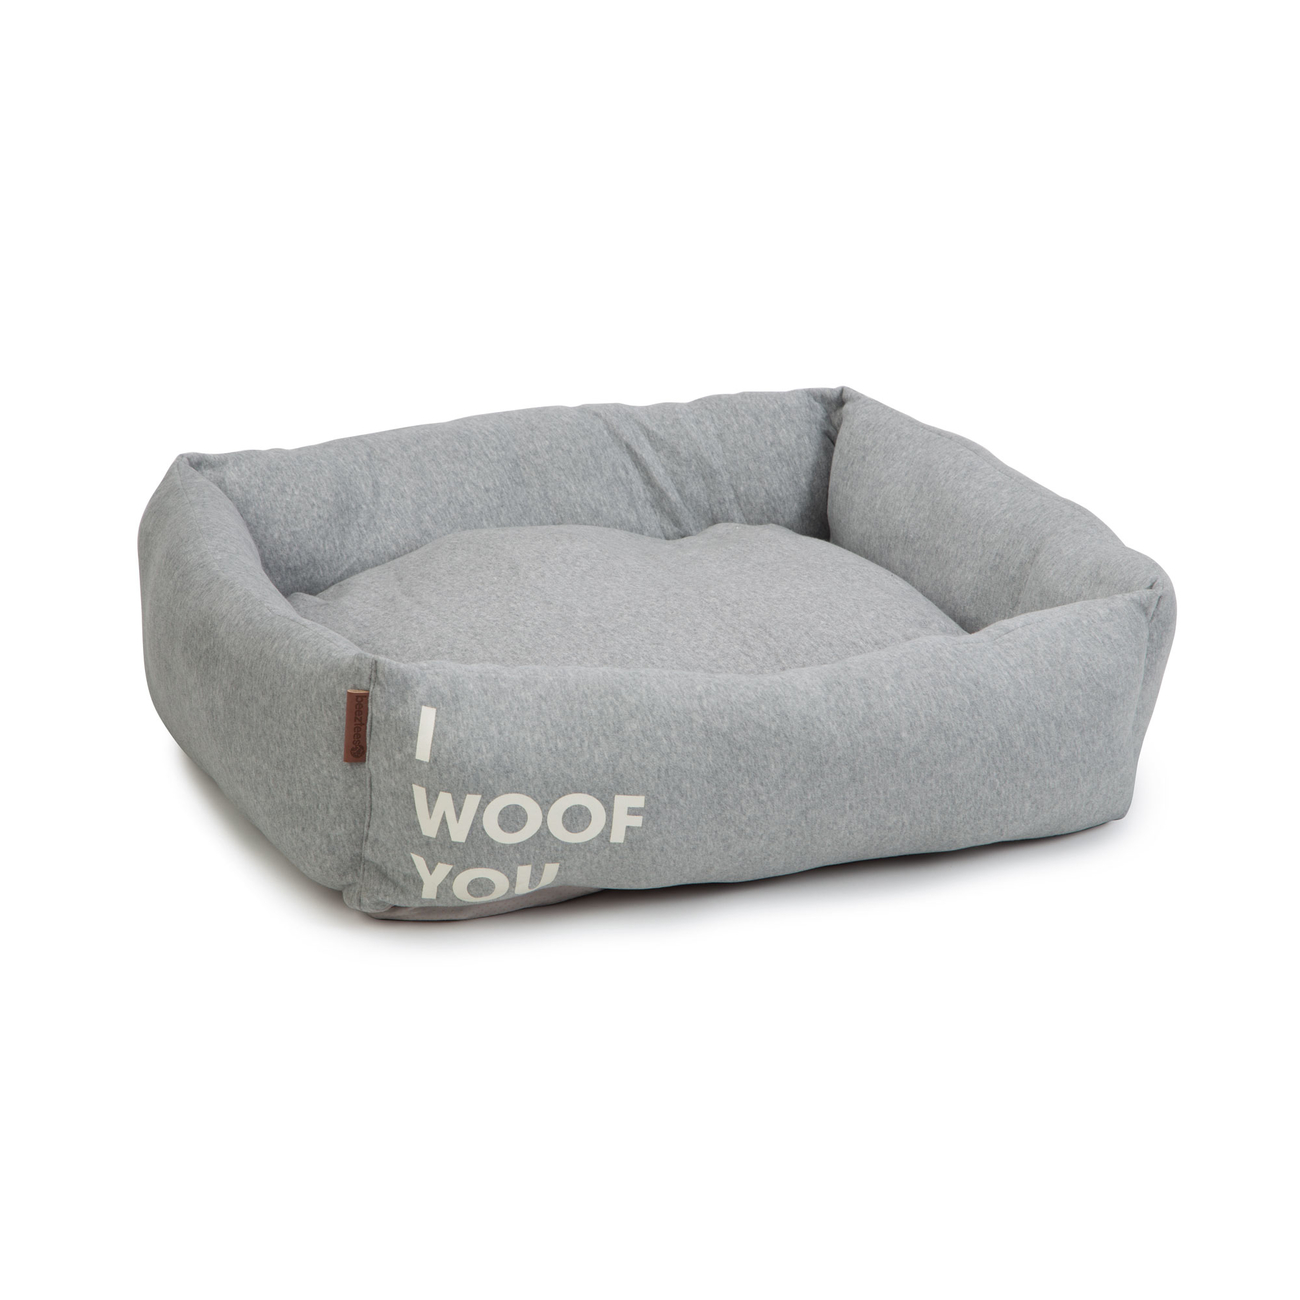 beeztees hundebett woof you von beeztees g nstig bestellen. Black Bedroom Furniture Sets. Home Design Ideas